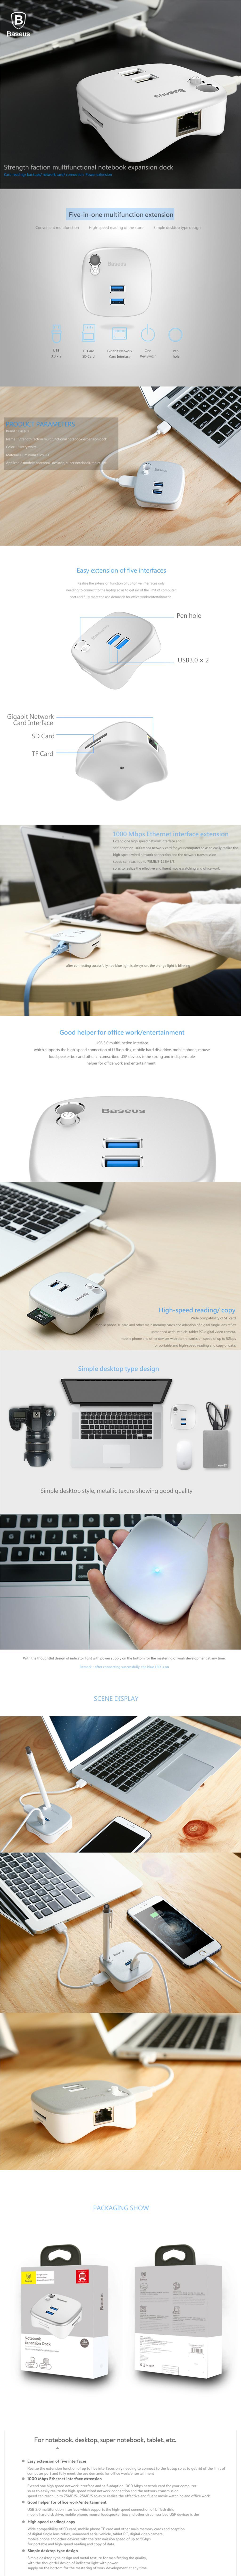 Laptop Desk Baseus 5 In 1 Notebook Extension Dock Extender Interface Usb 3.0 Multiple Charger Adapter For Ultrabook Tablet